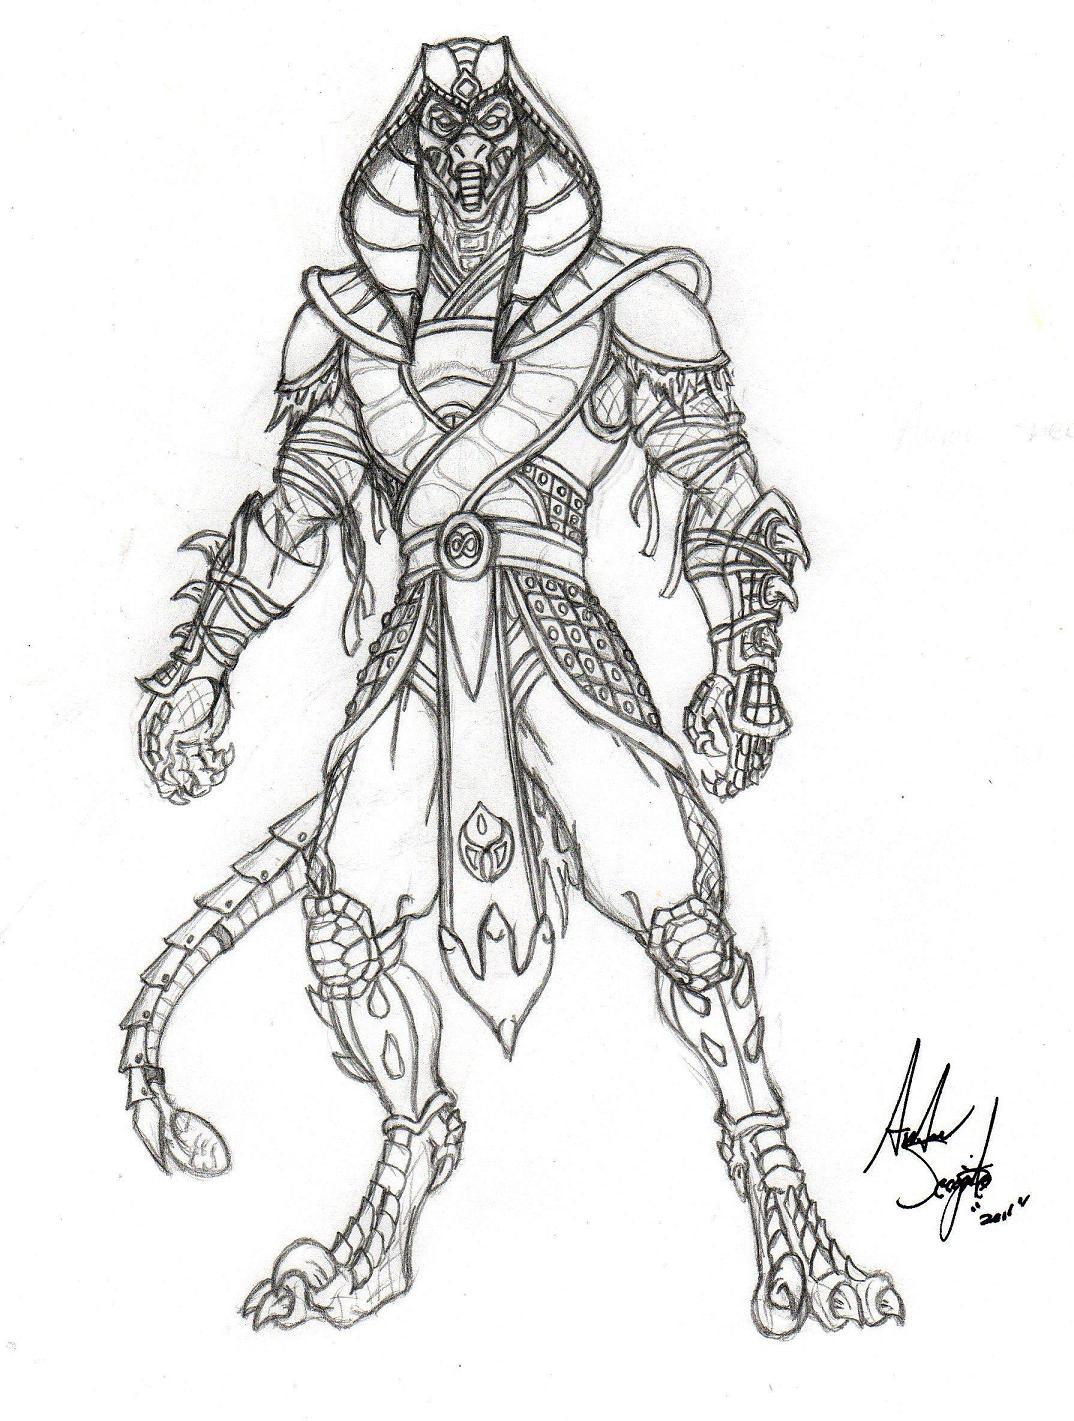 1074x1421 Marvellous Design Mortal Kombat Coloring Pages To Print Xl